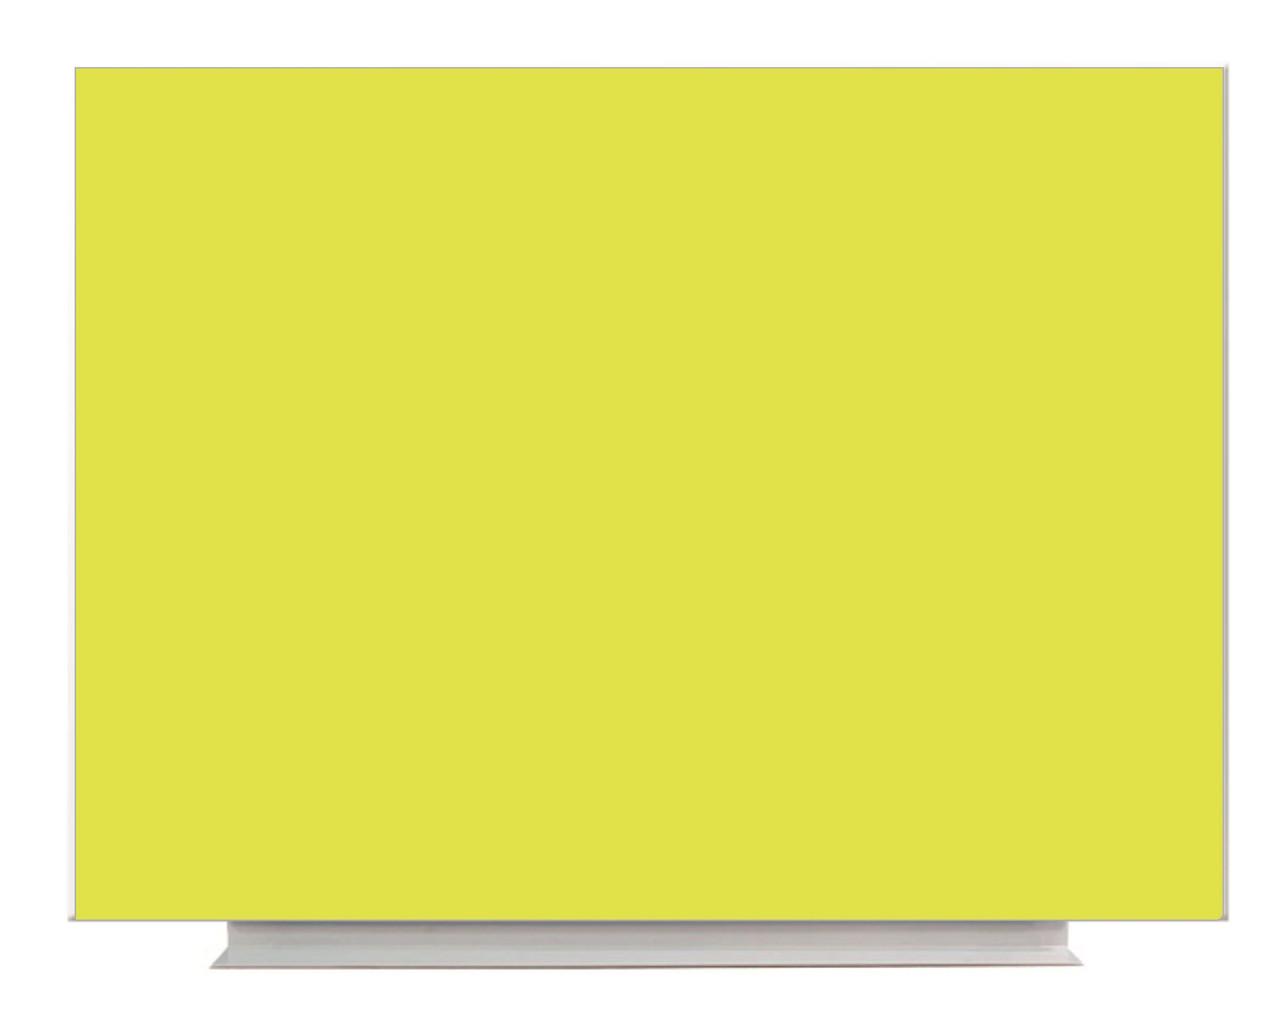 Доска магнитно-маркерная б/р 90x120 Желтый